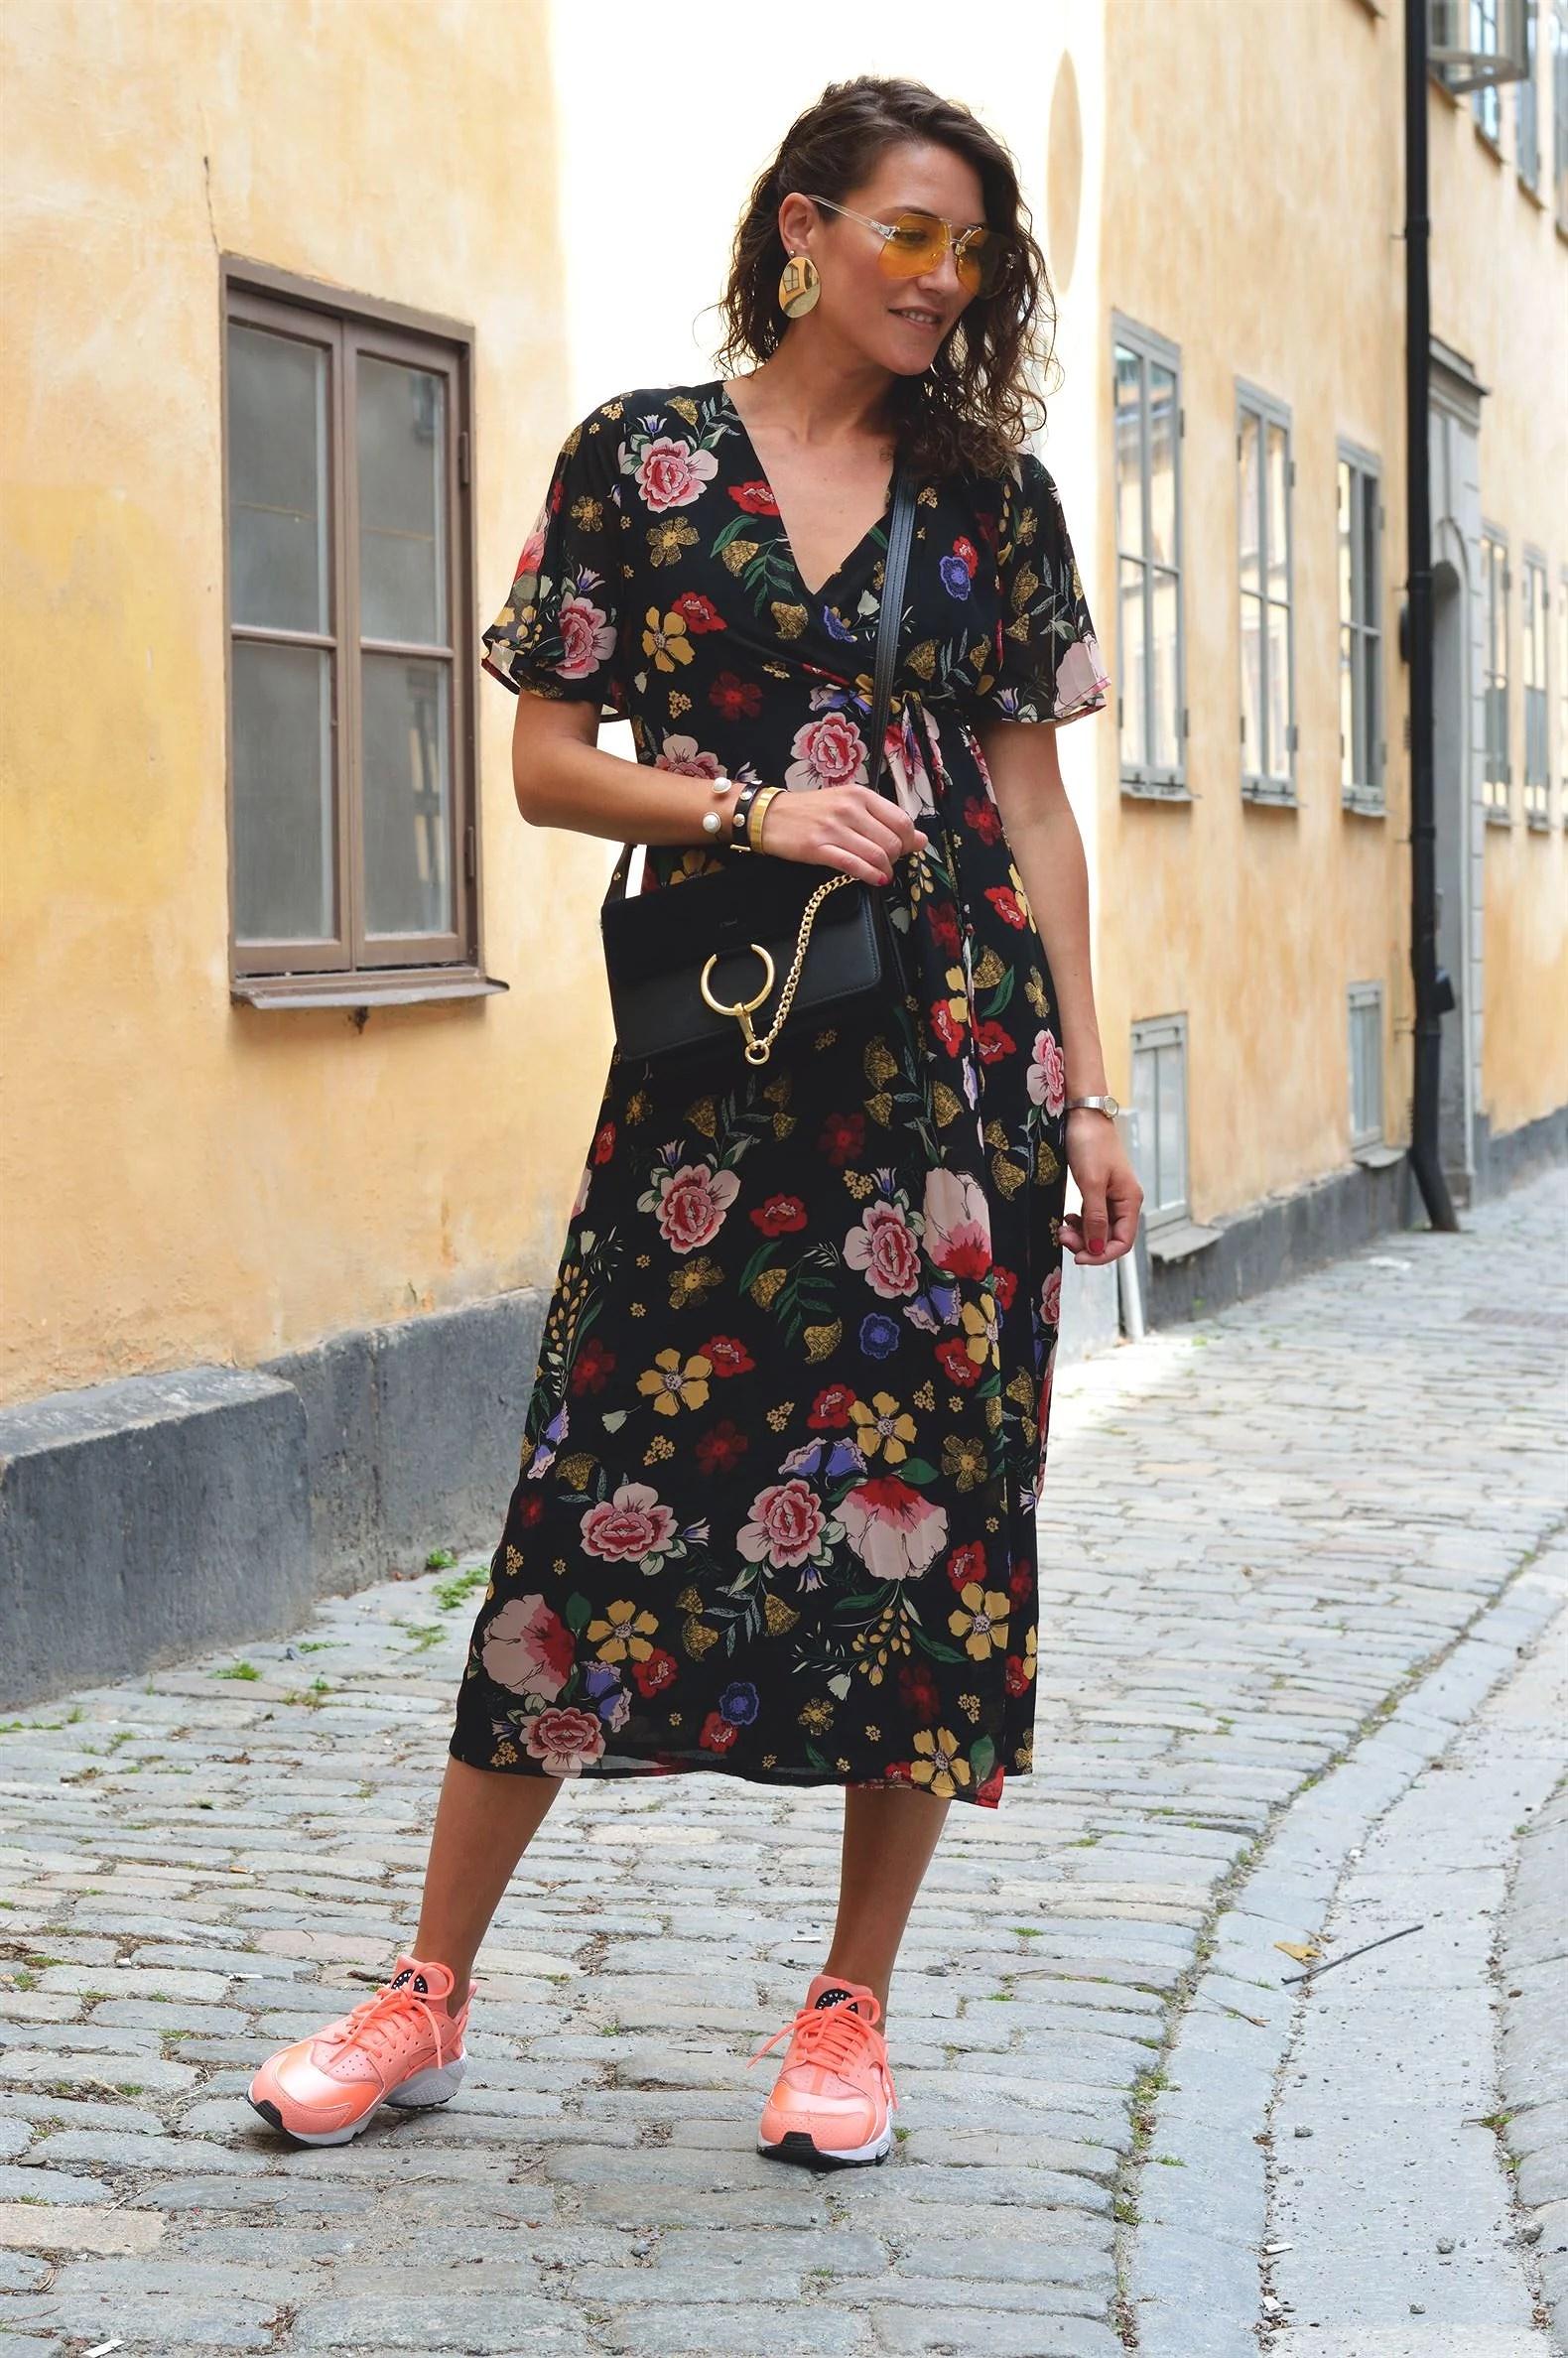 Floral Wrap Dress & Yellow Sunglasses